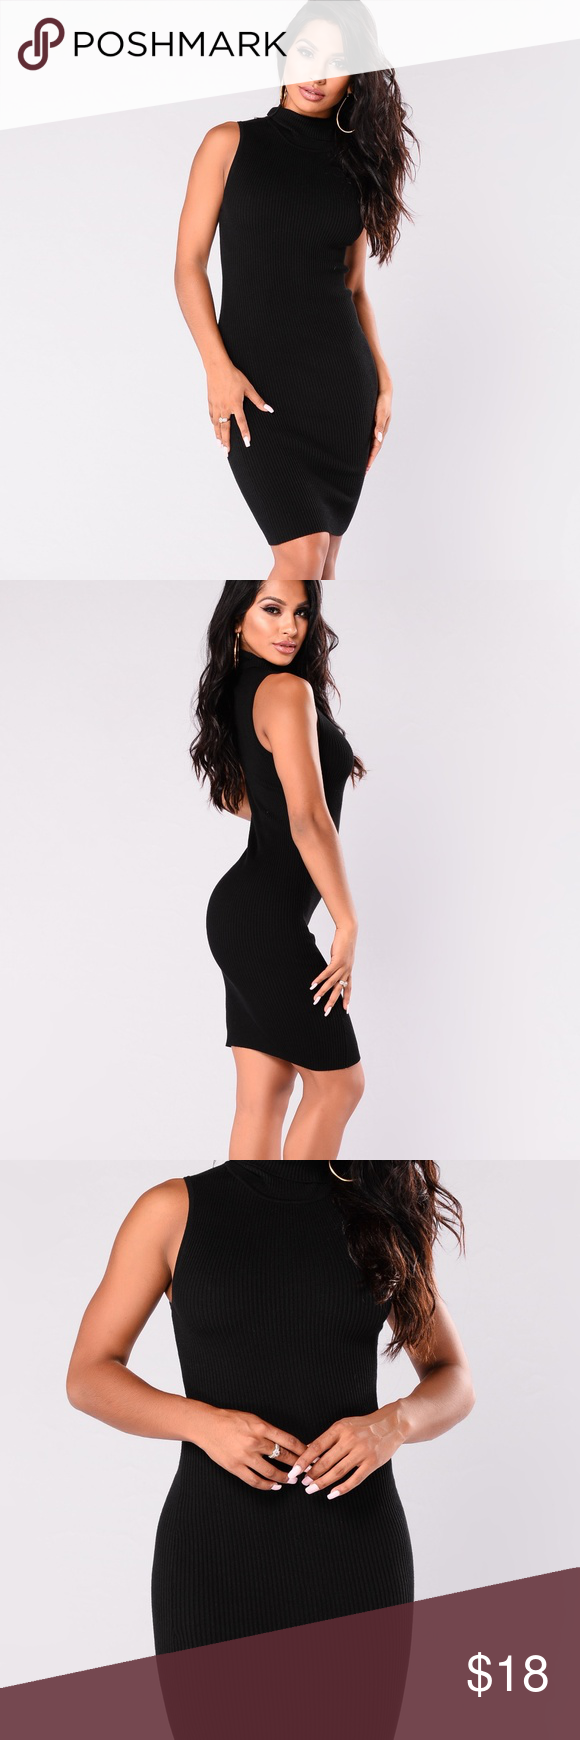 ba2859e8ce8 NEW Fashion Nova Sleeveless Black Bodycon Dress M NEW Fashion Nova  Sleeveless Knit Black Bodycon Dress